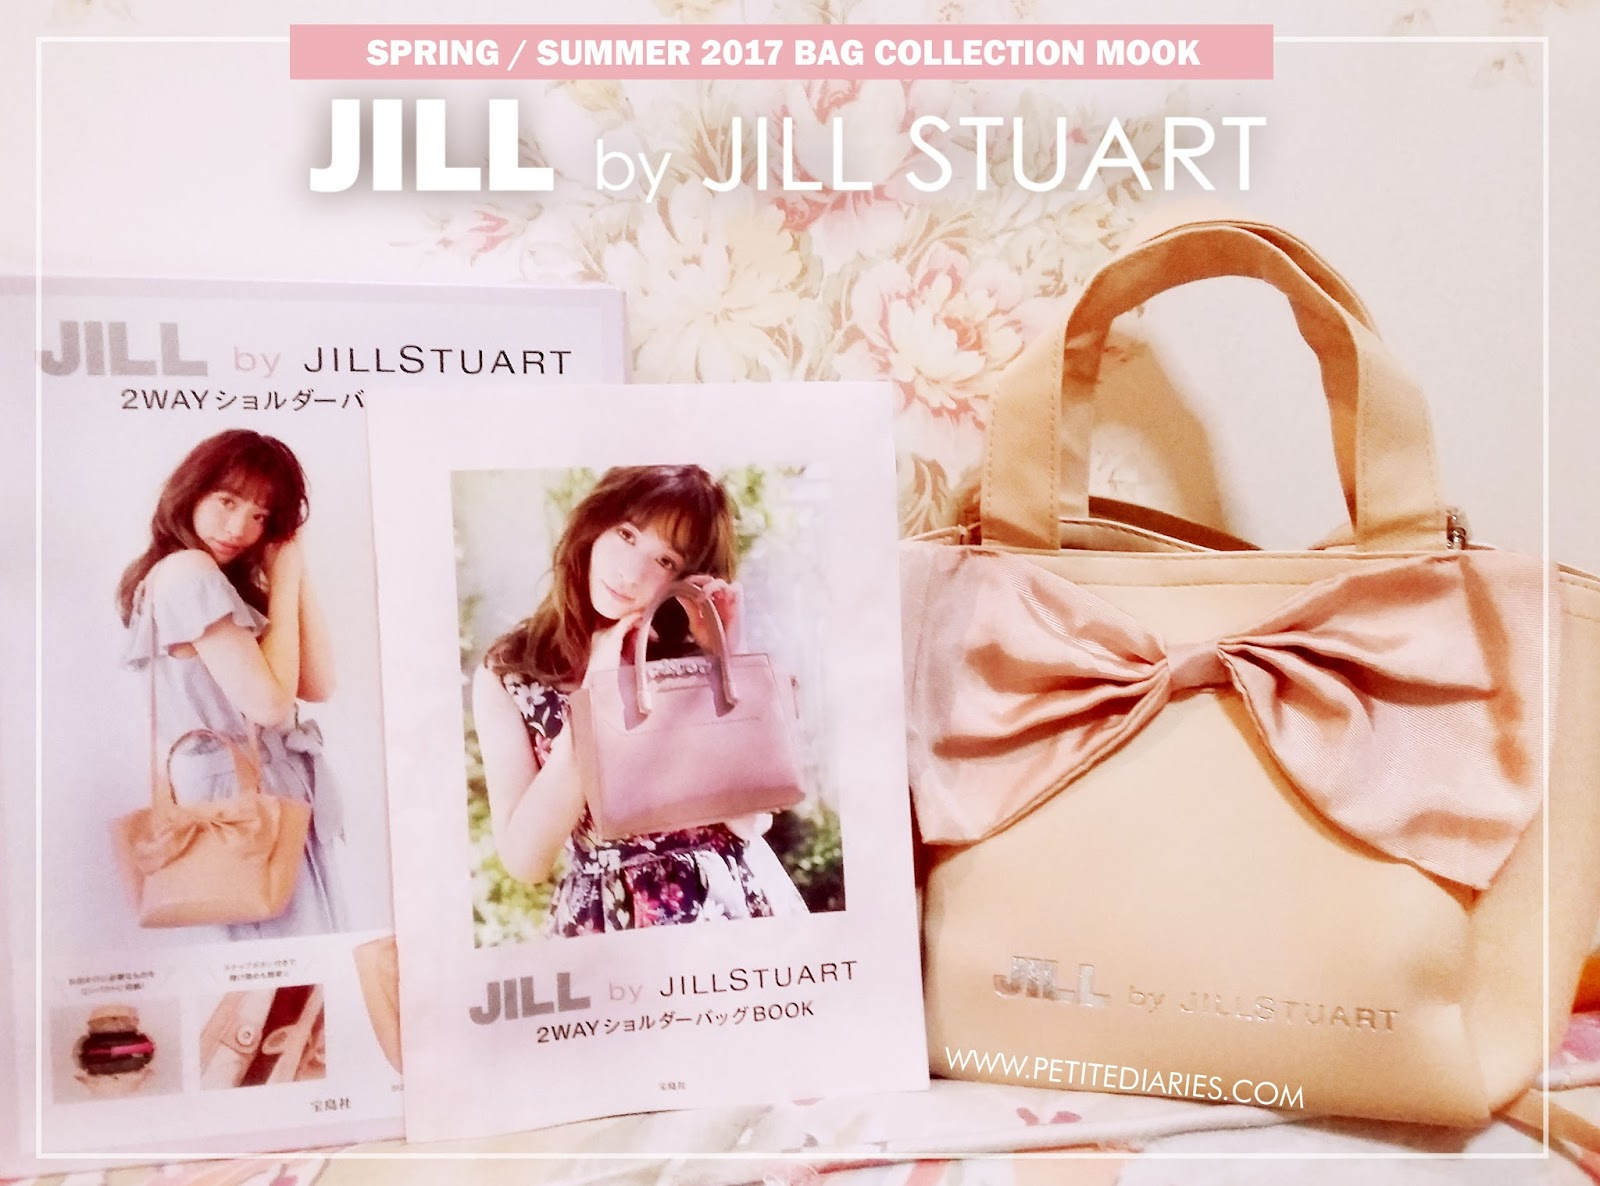 JILL BY JILLSTUART 2017 SPRING SUMMER MOOK 本 2wayショルダーバッグ PREVIEW